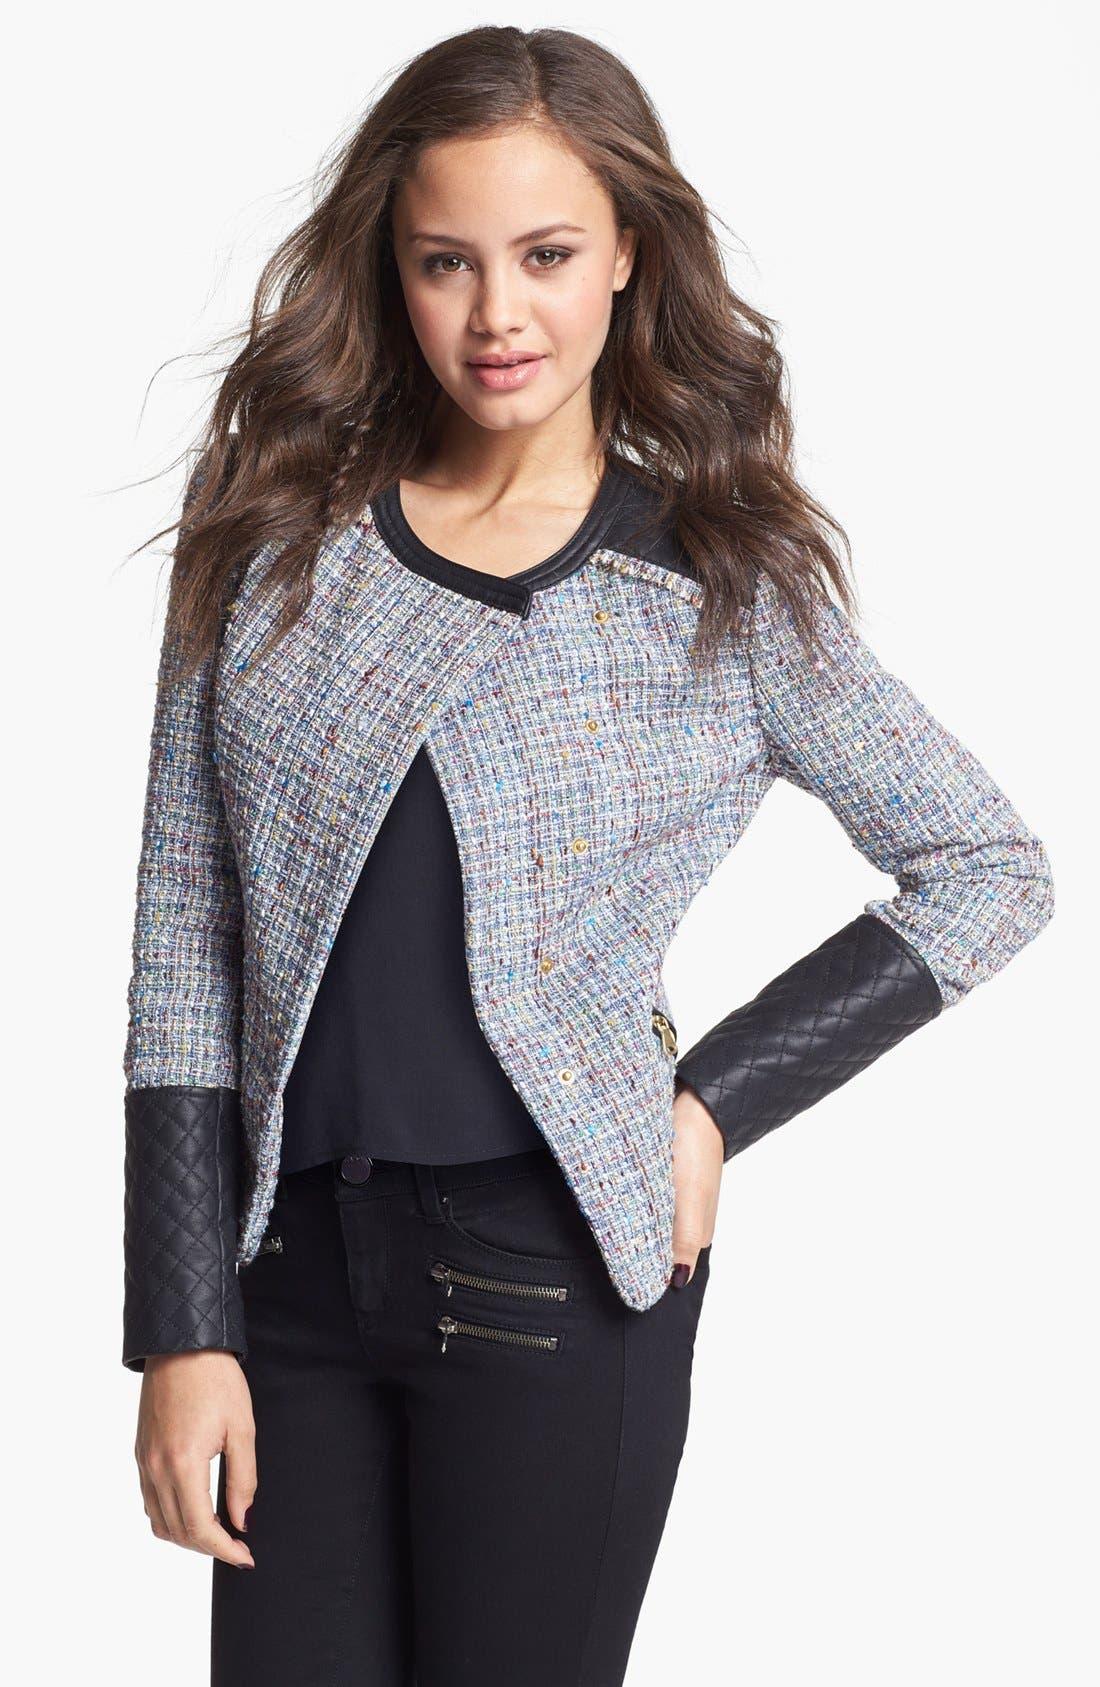 Alternate Image 1 Selected - Collection B Faux Leather & Bouclé Jacket (Juniors)